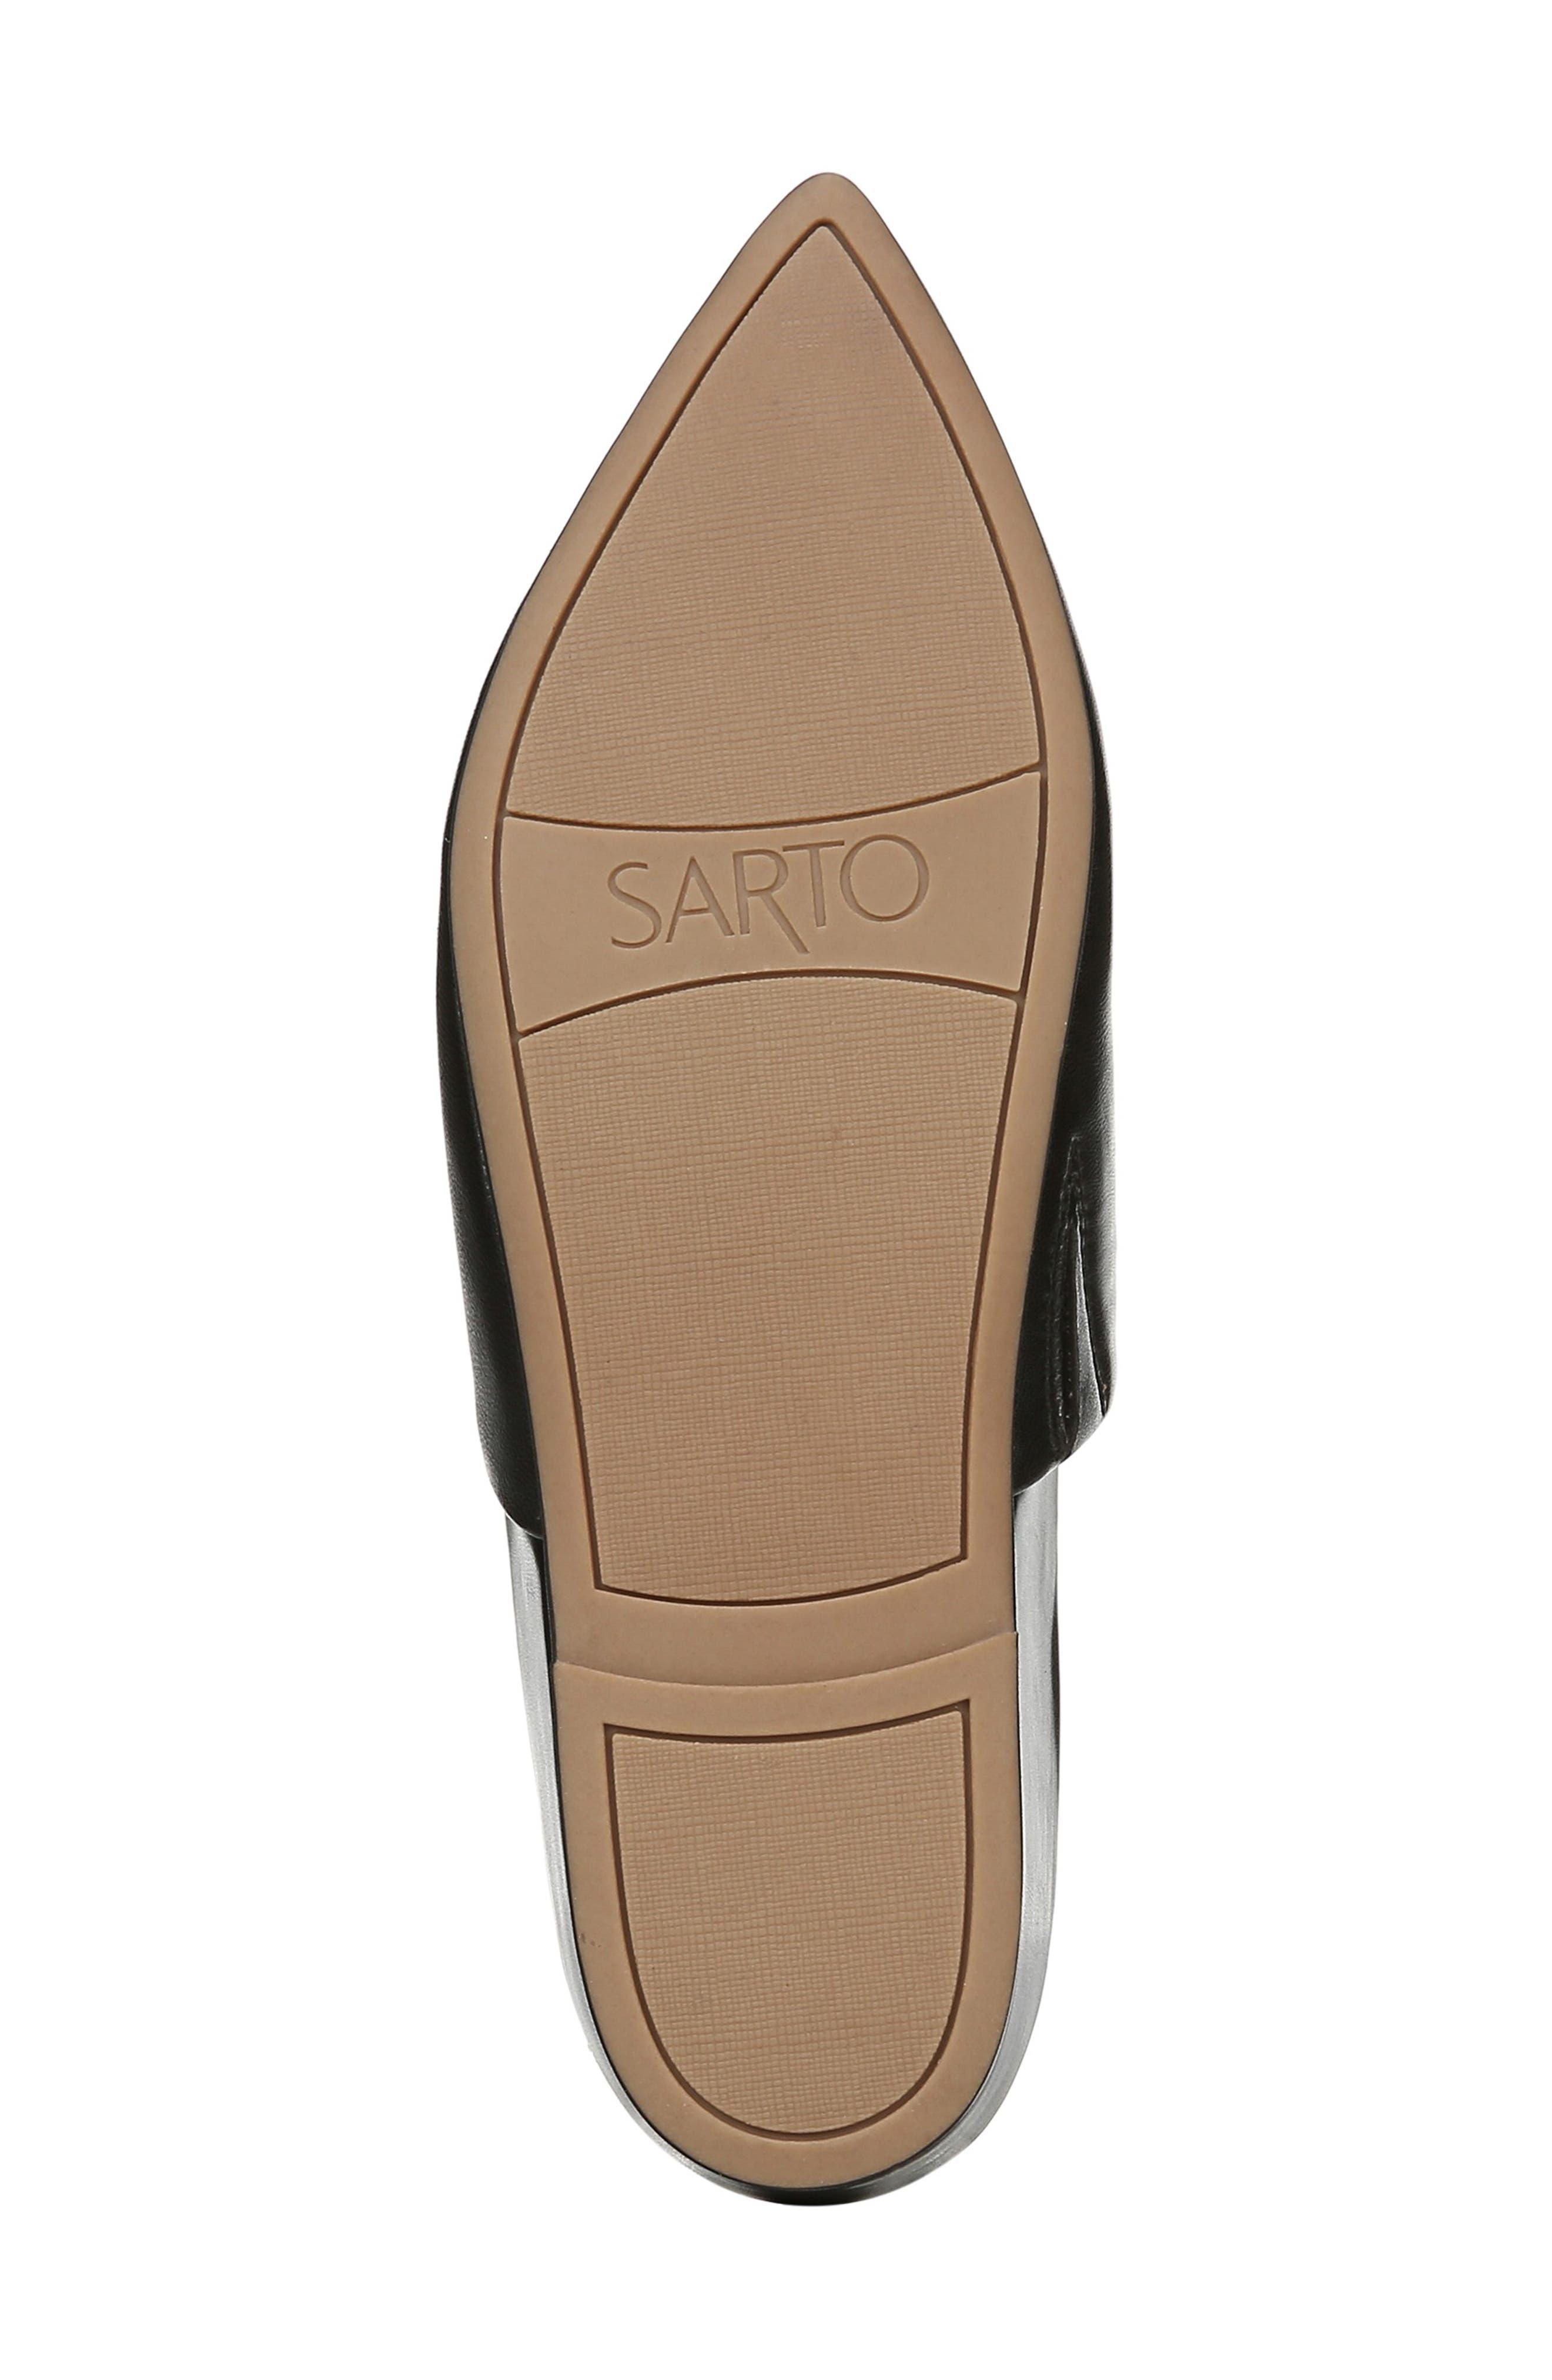 SARTO BY FRANCO SARTO,                             Irma Pointy Toe Mule,                             Alternate thumbnail 6, color,                             BLACK LEATHER